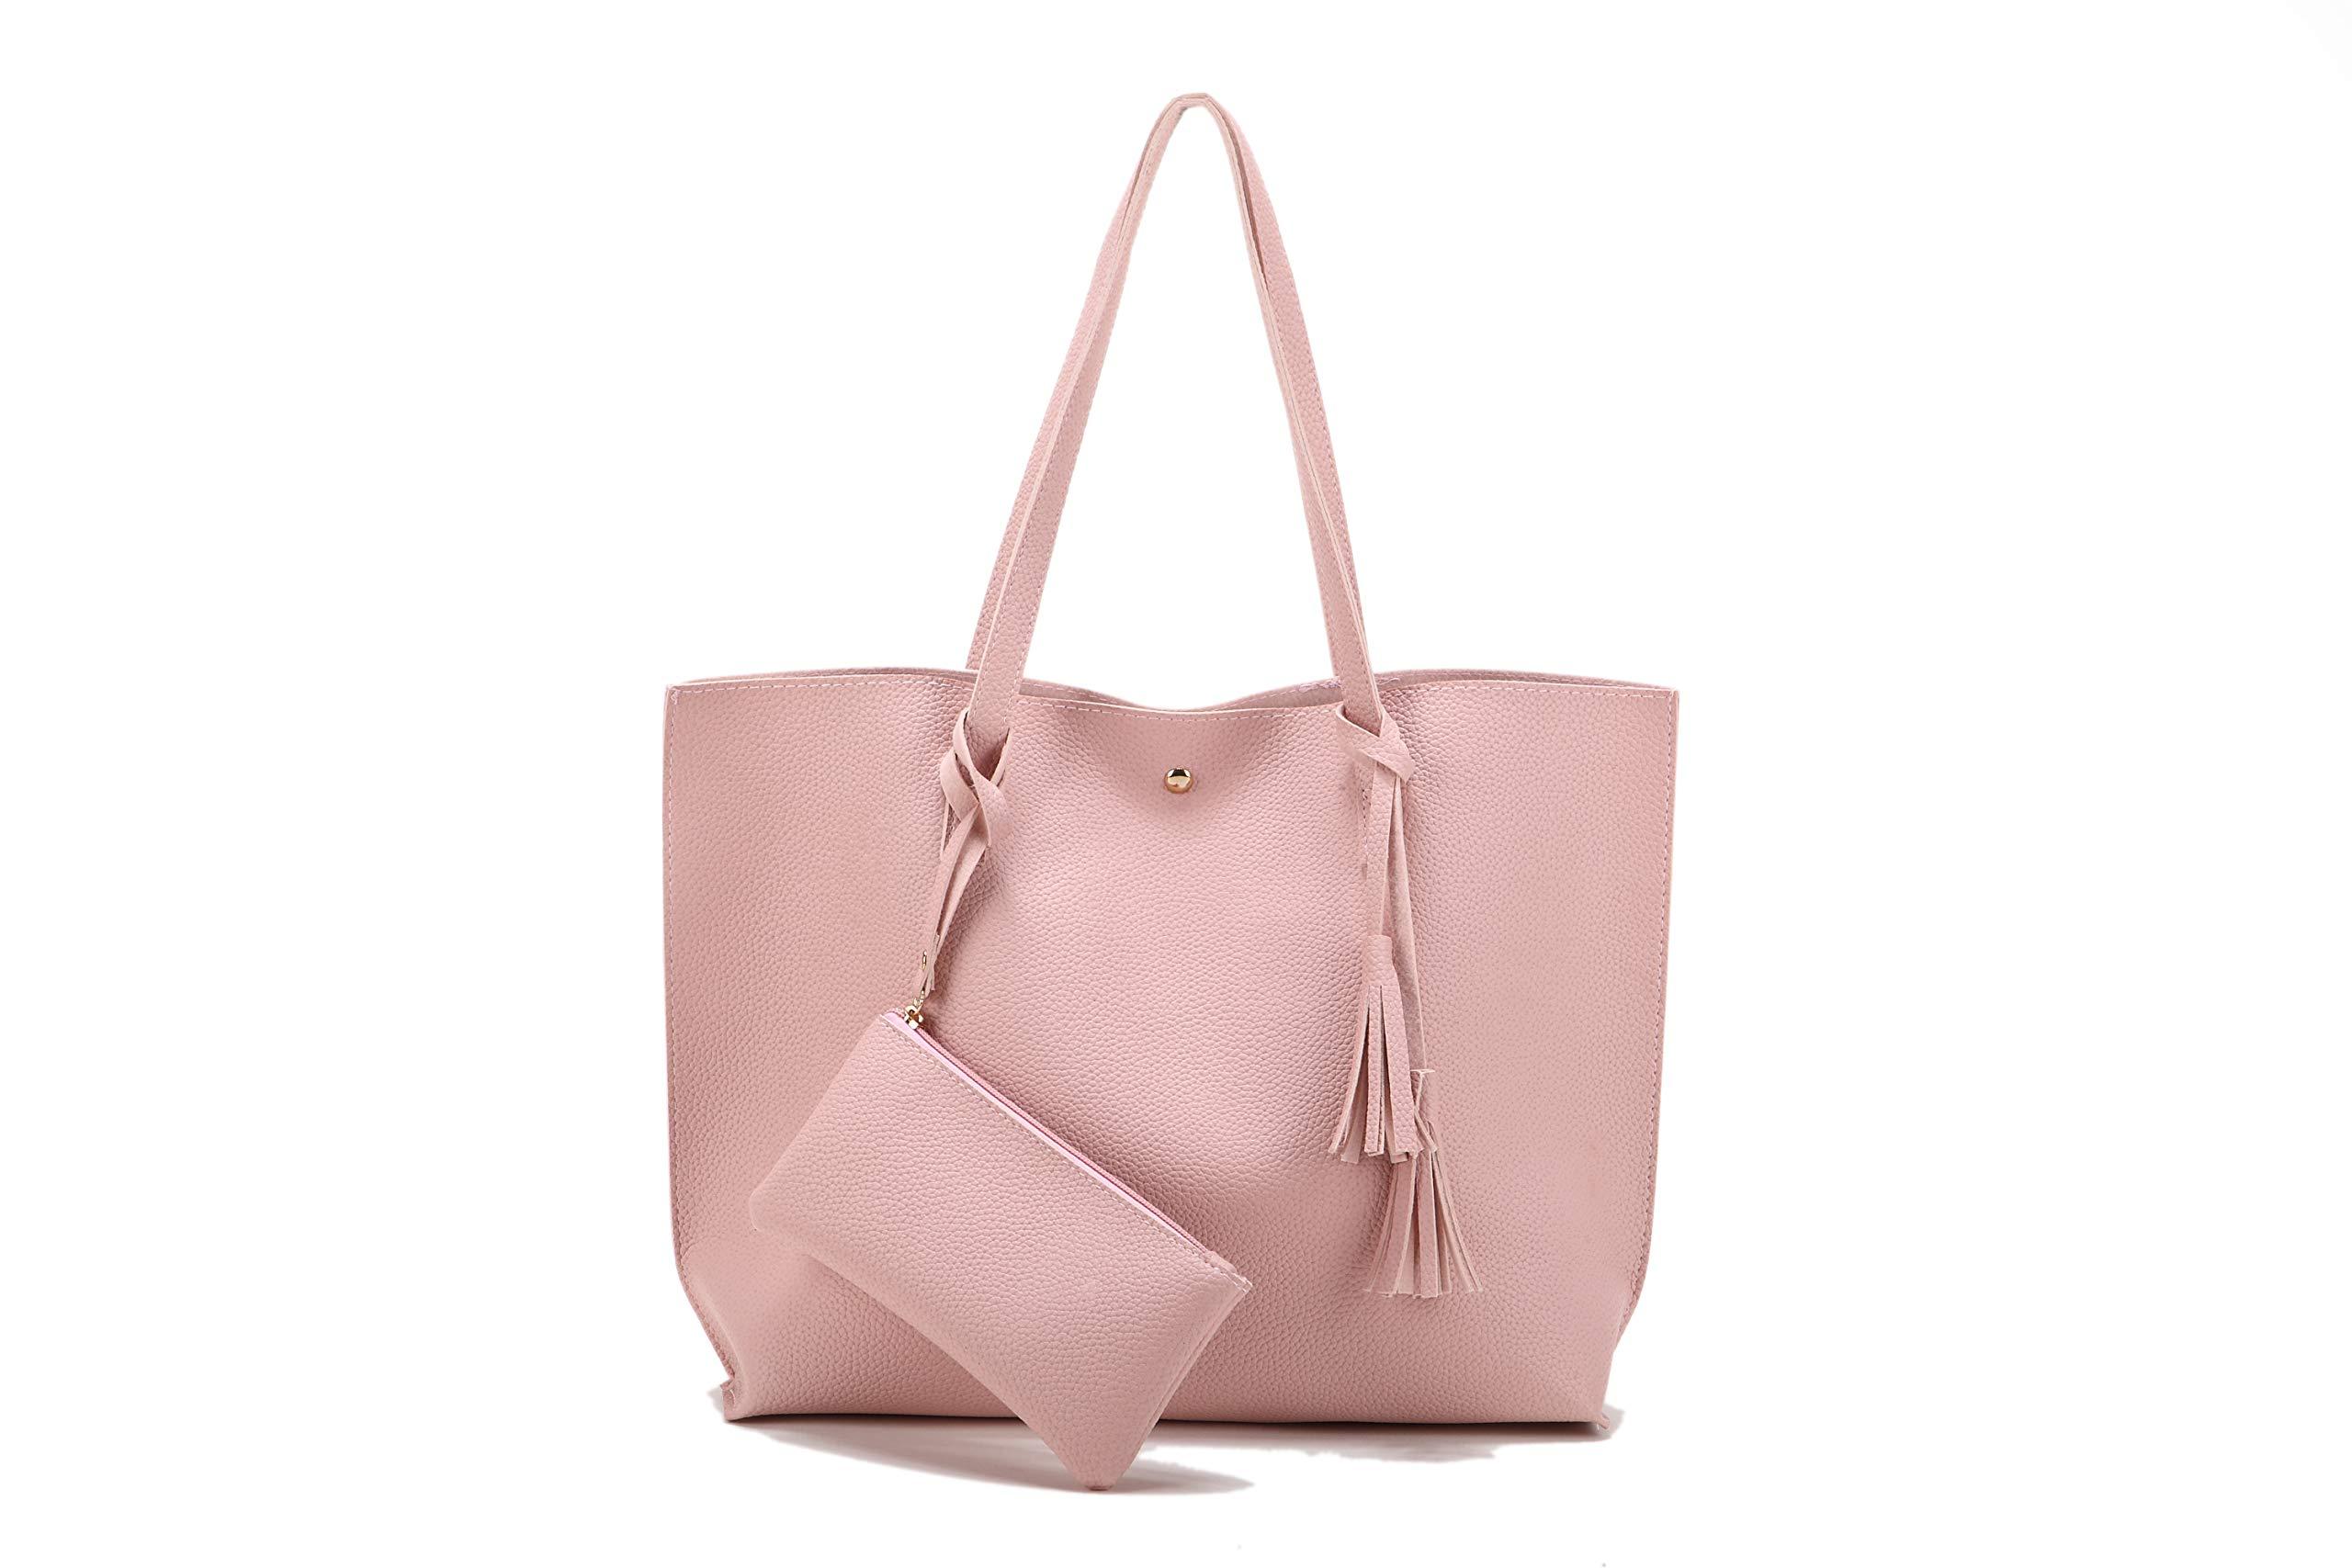 Nodykka Women Tote Bags Shoulder Top Handle Satchel Handbags PU Pebbled Leather Tassel Purse With Wallet